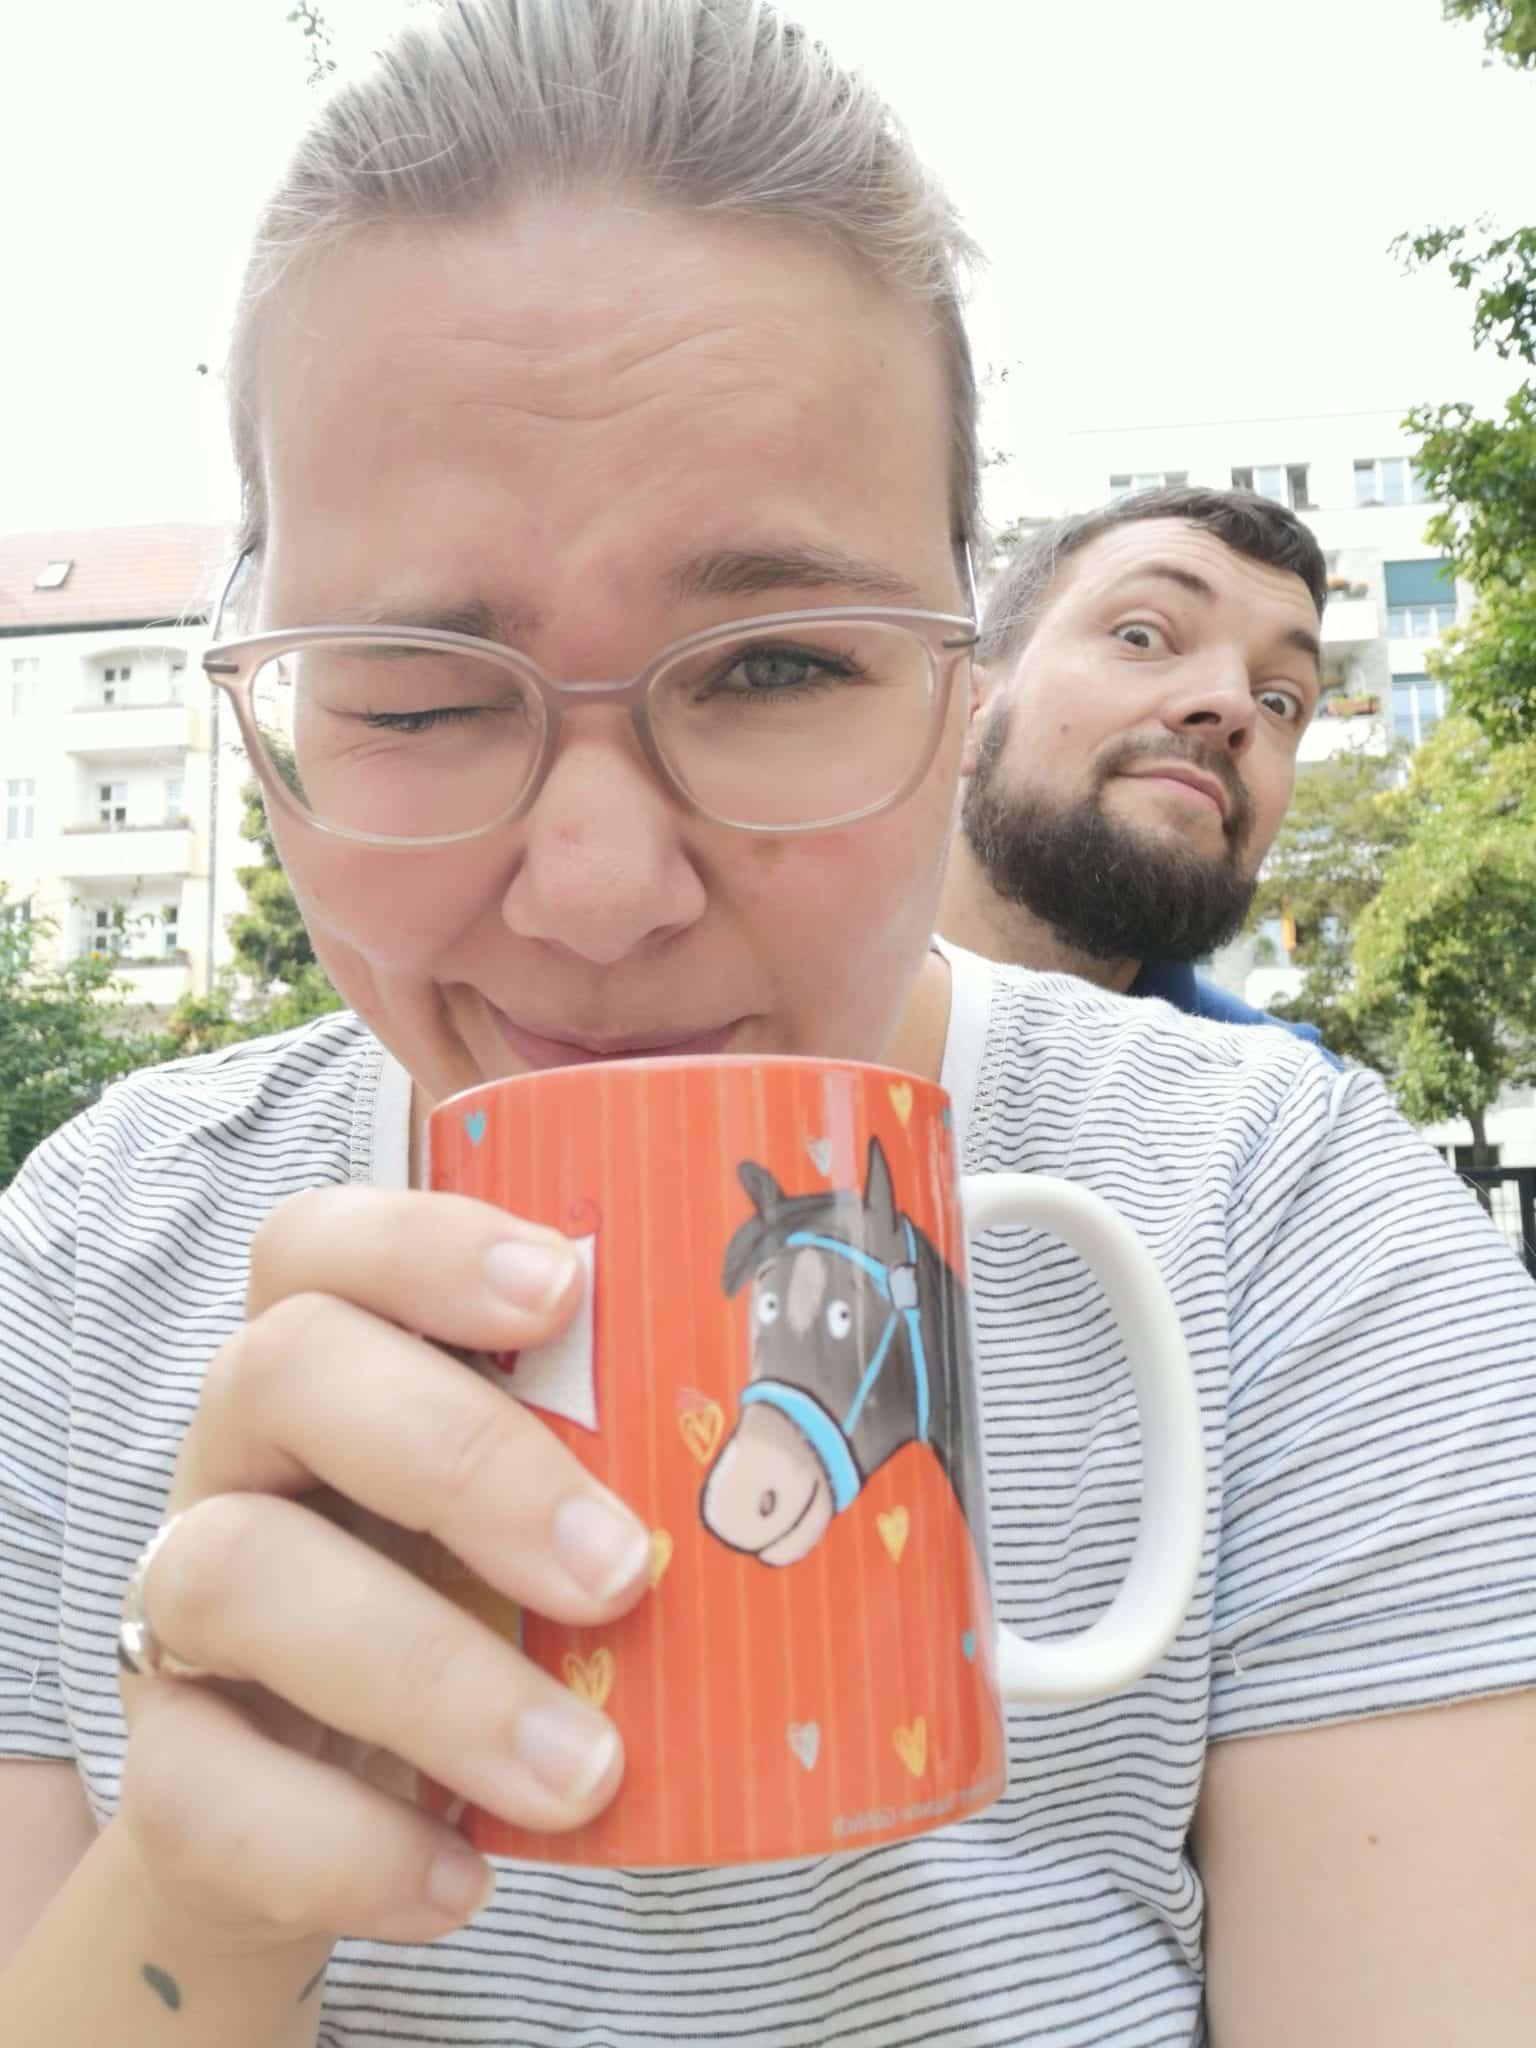 Mamablog Berlin Papablog